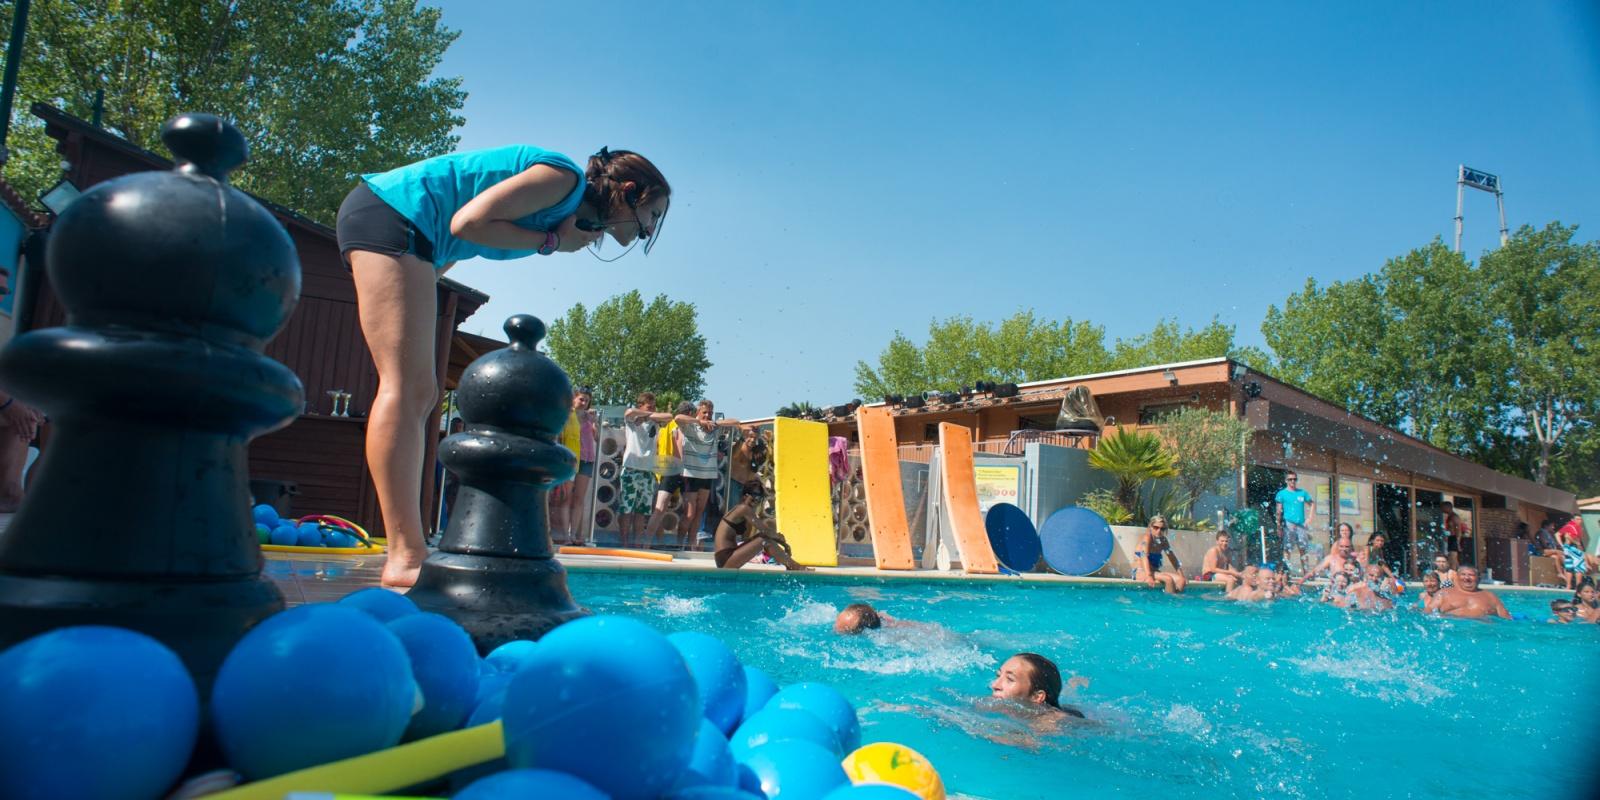 Piscine d 39 t piscine couverte camping au grau du roi for Tarif piscine couverte